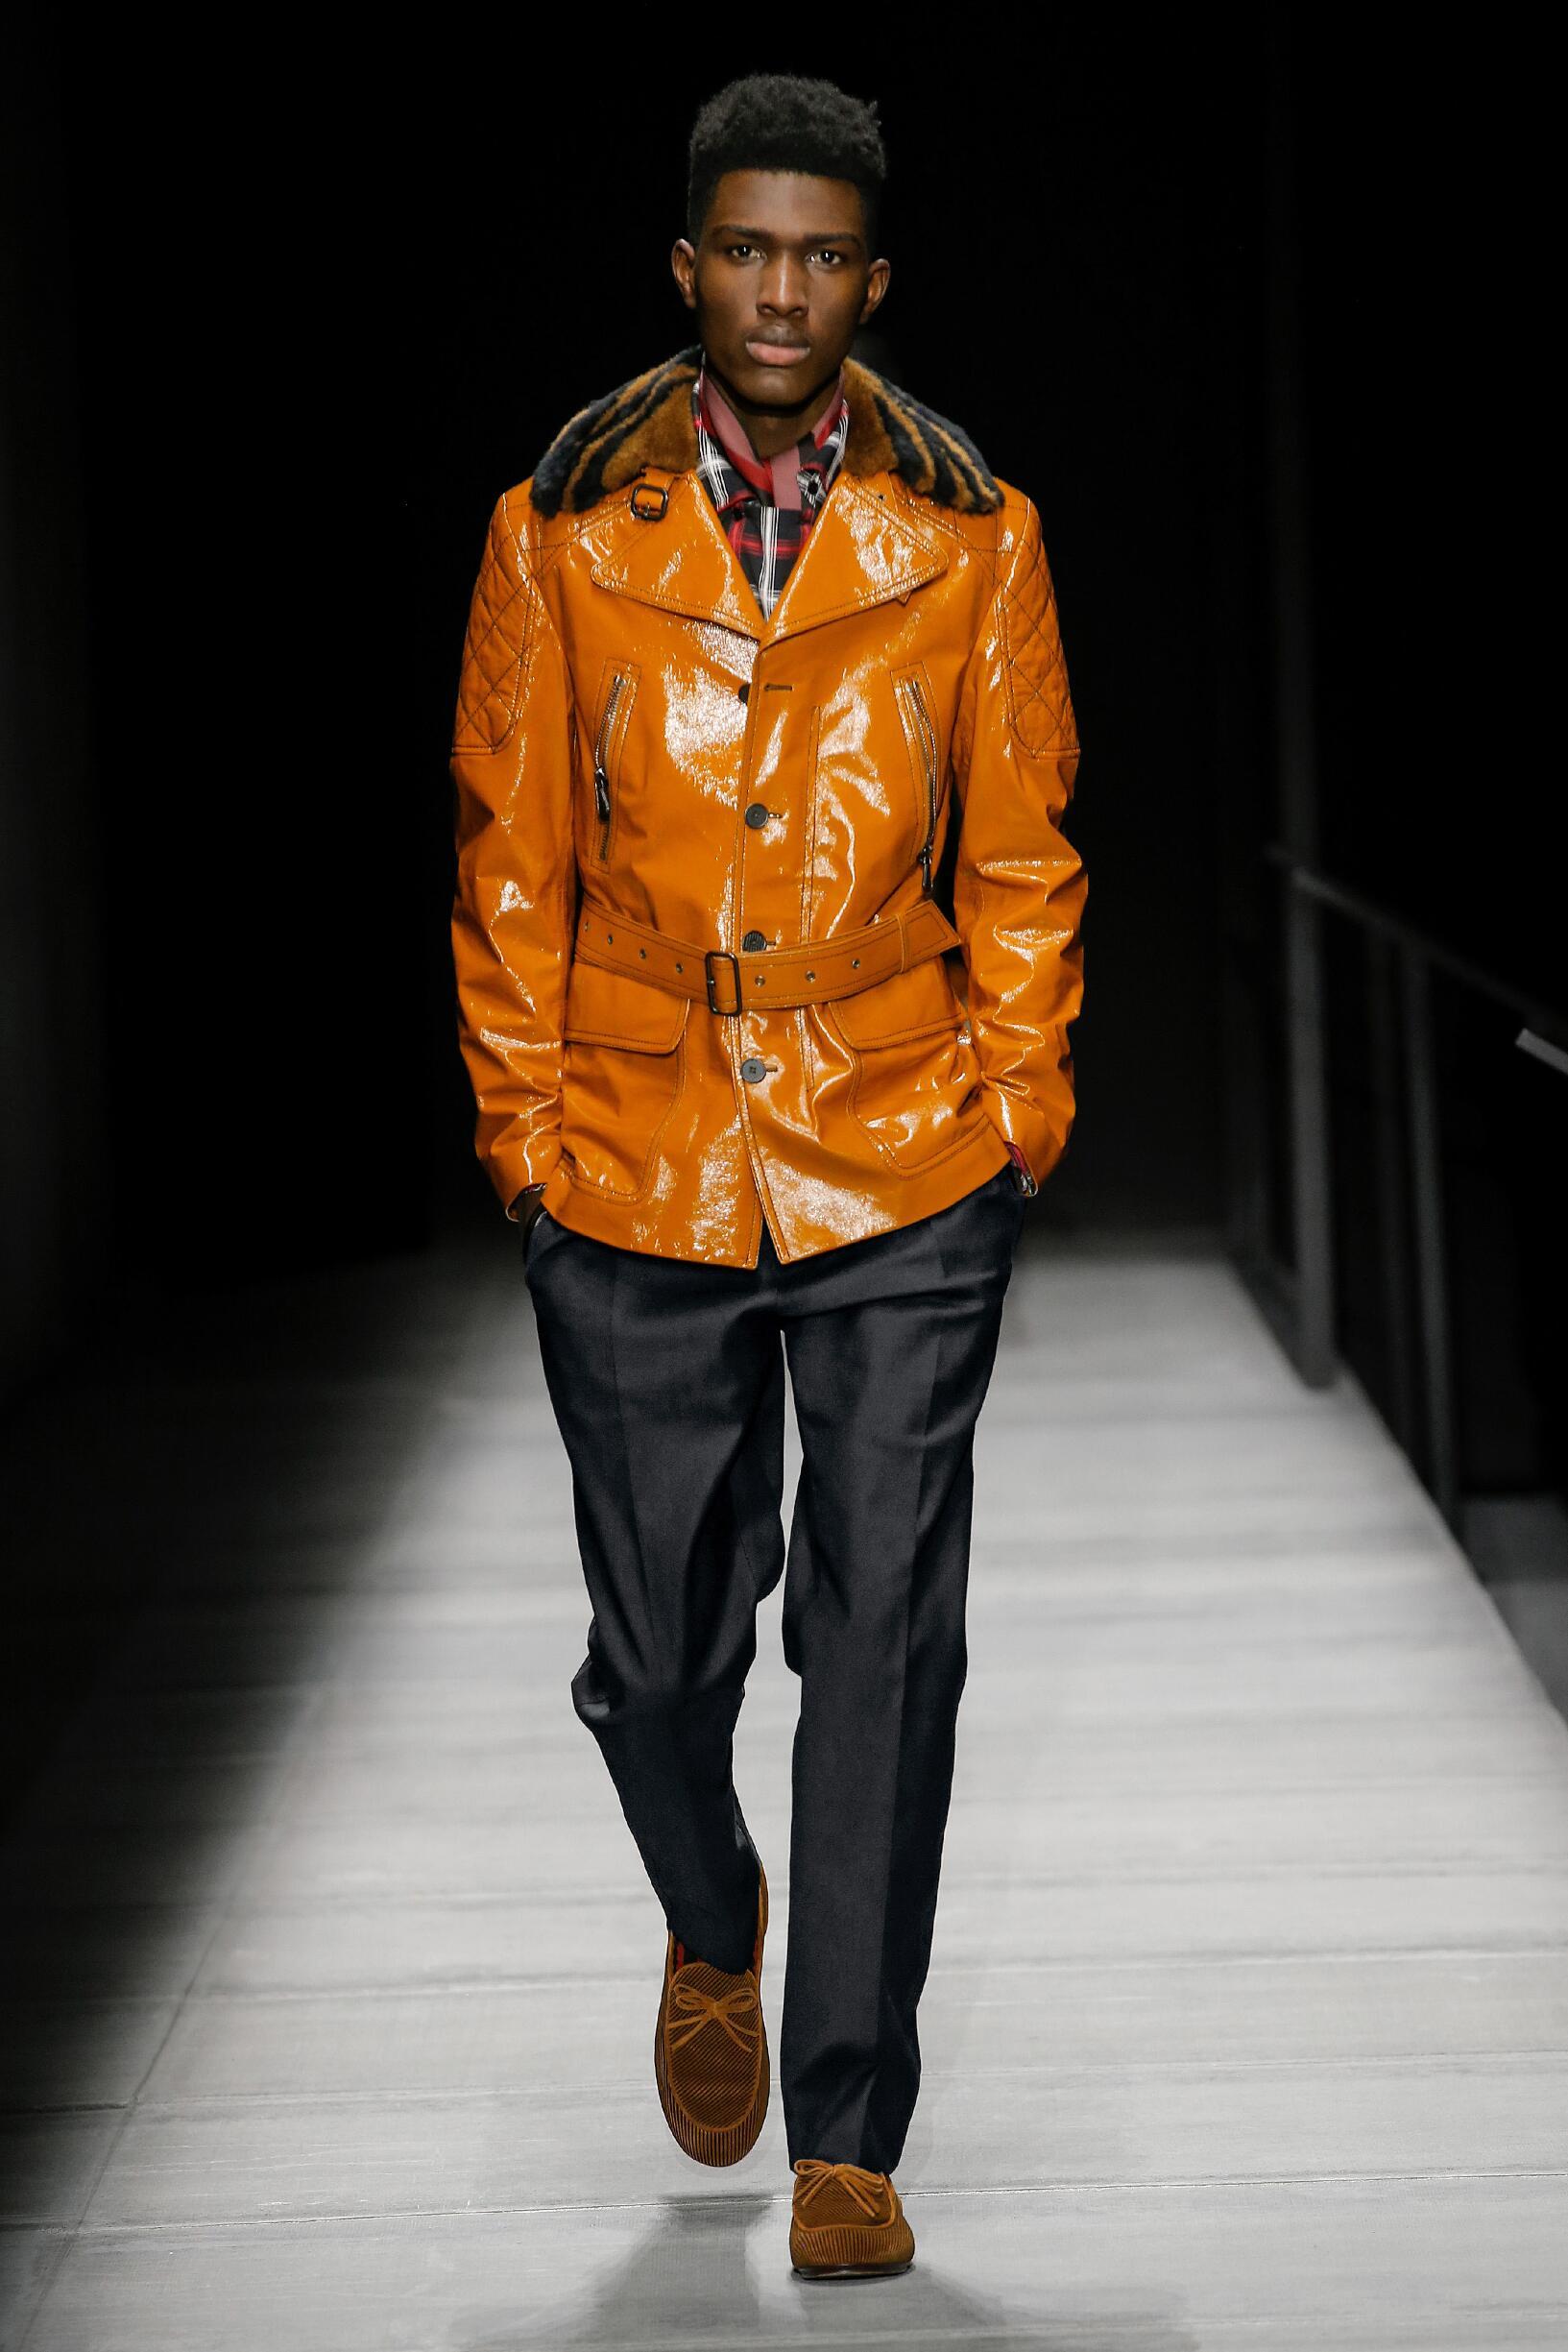 Runway Bottega Veneta Fall Winter 2018 Men's Collection New York Fashion Week